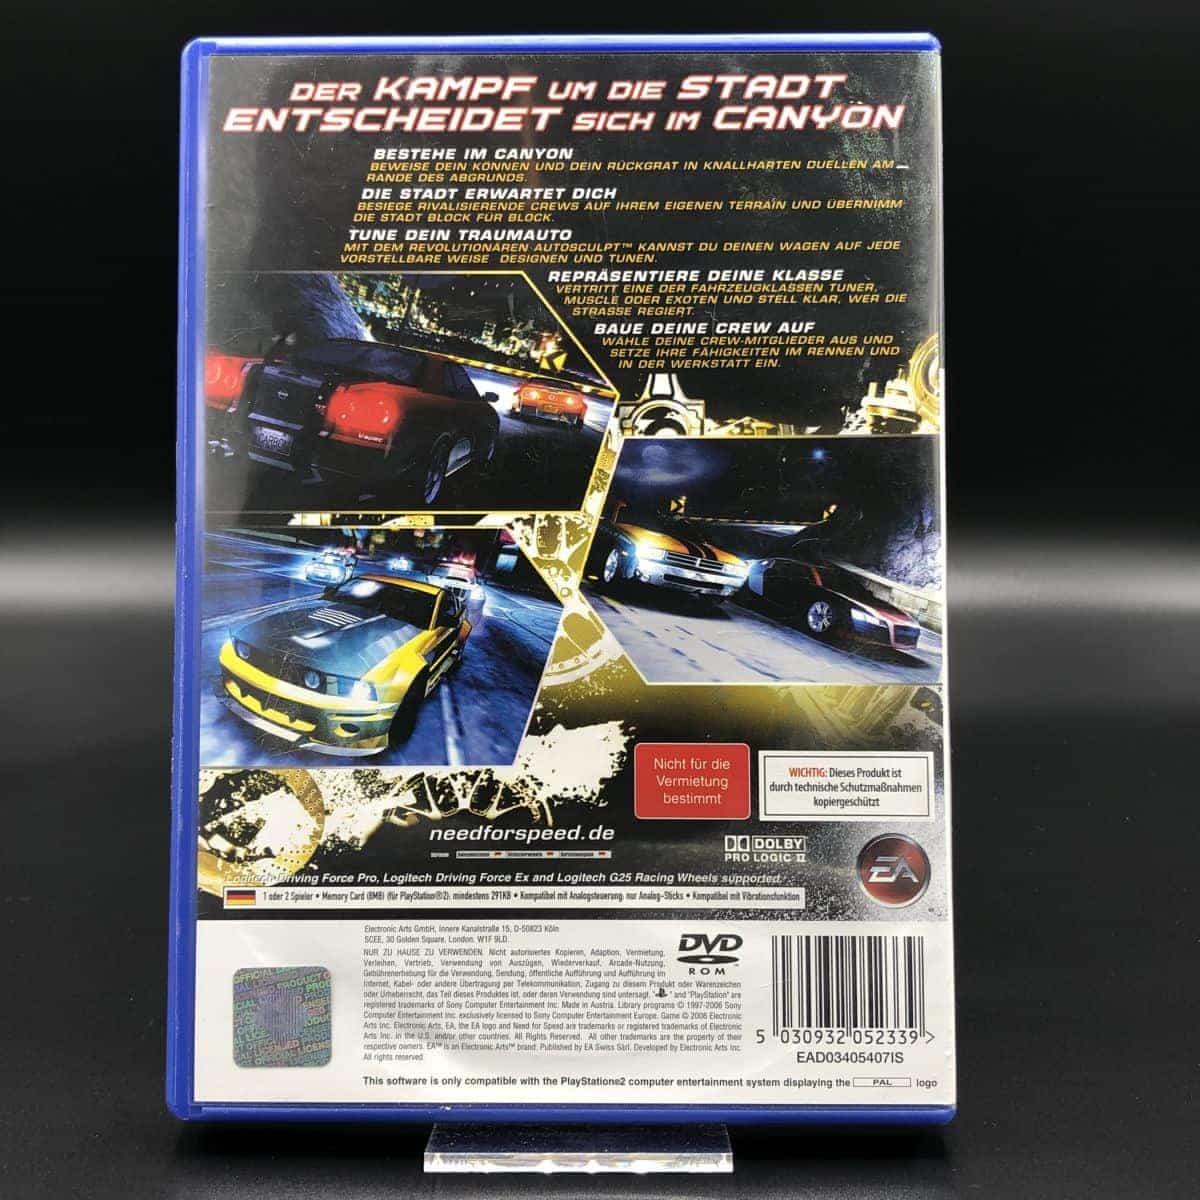 PS2 Need for Speed: Carbon (Komplett) (Gebrauchsspuren) Sony PlayStation 2